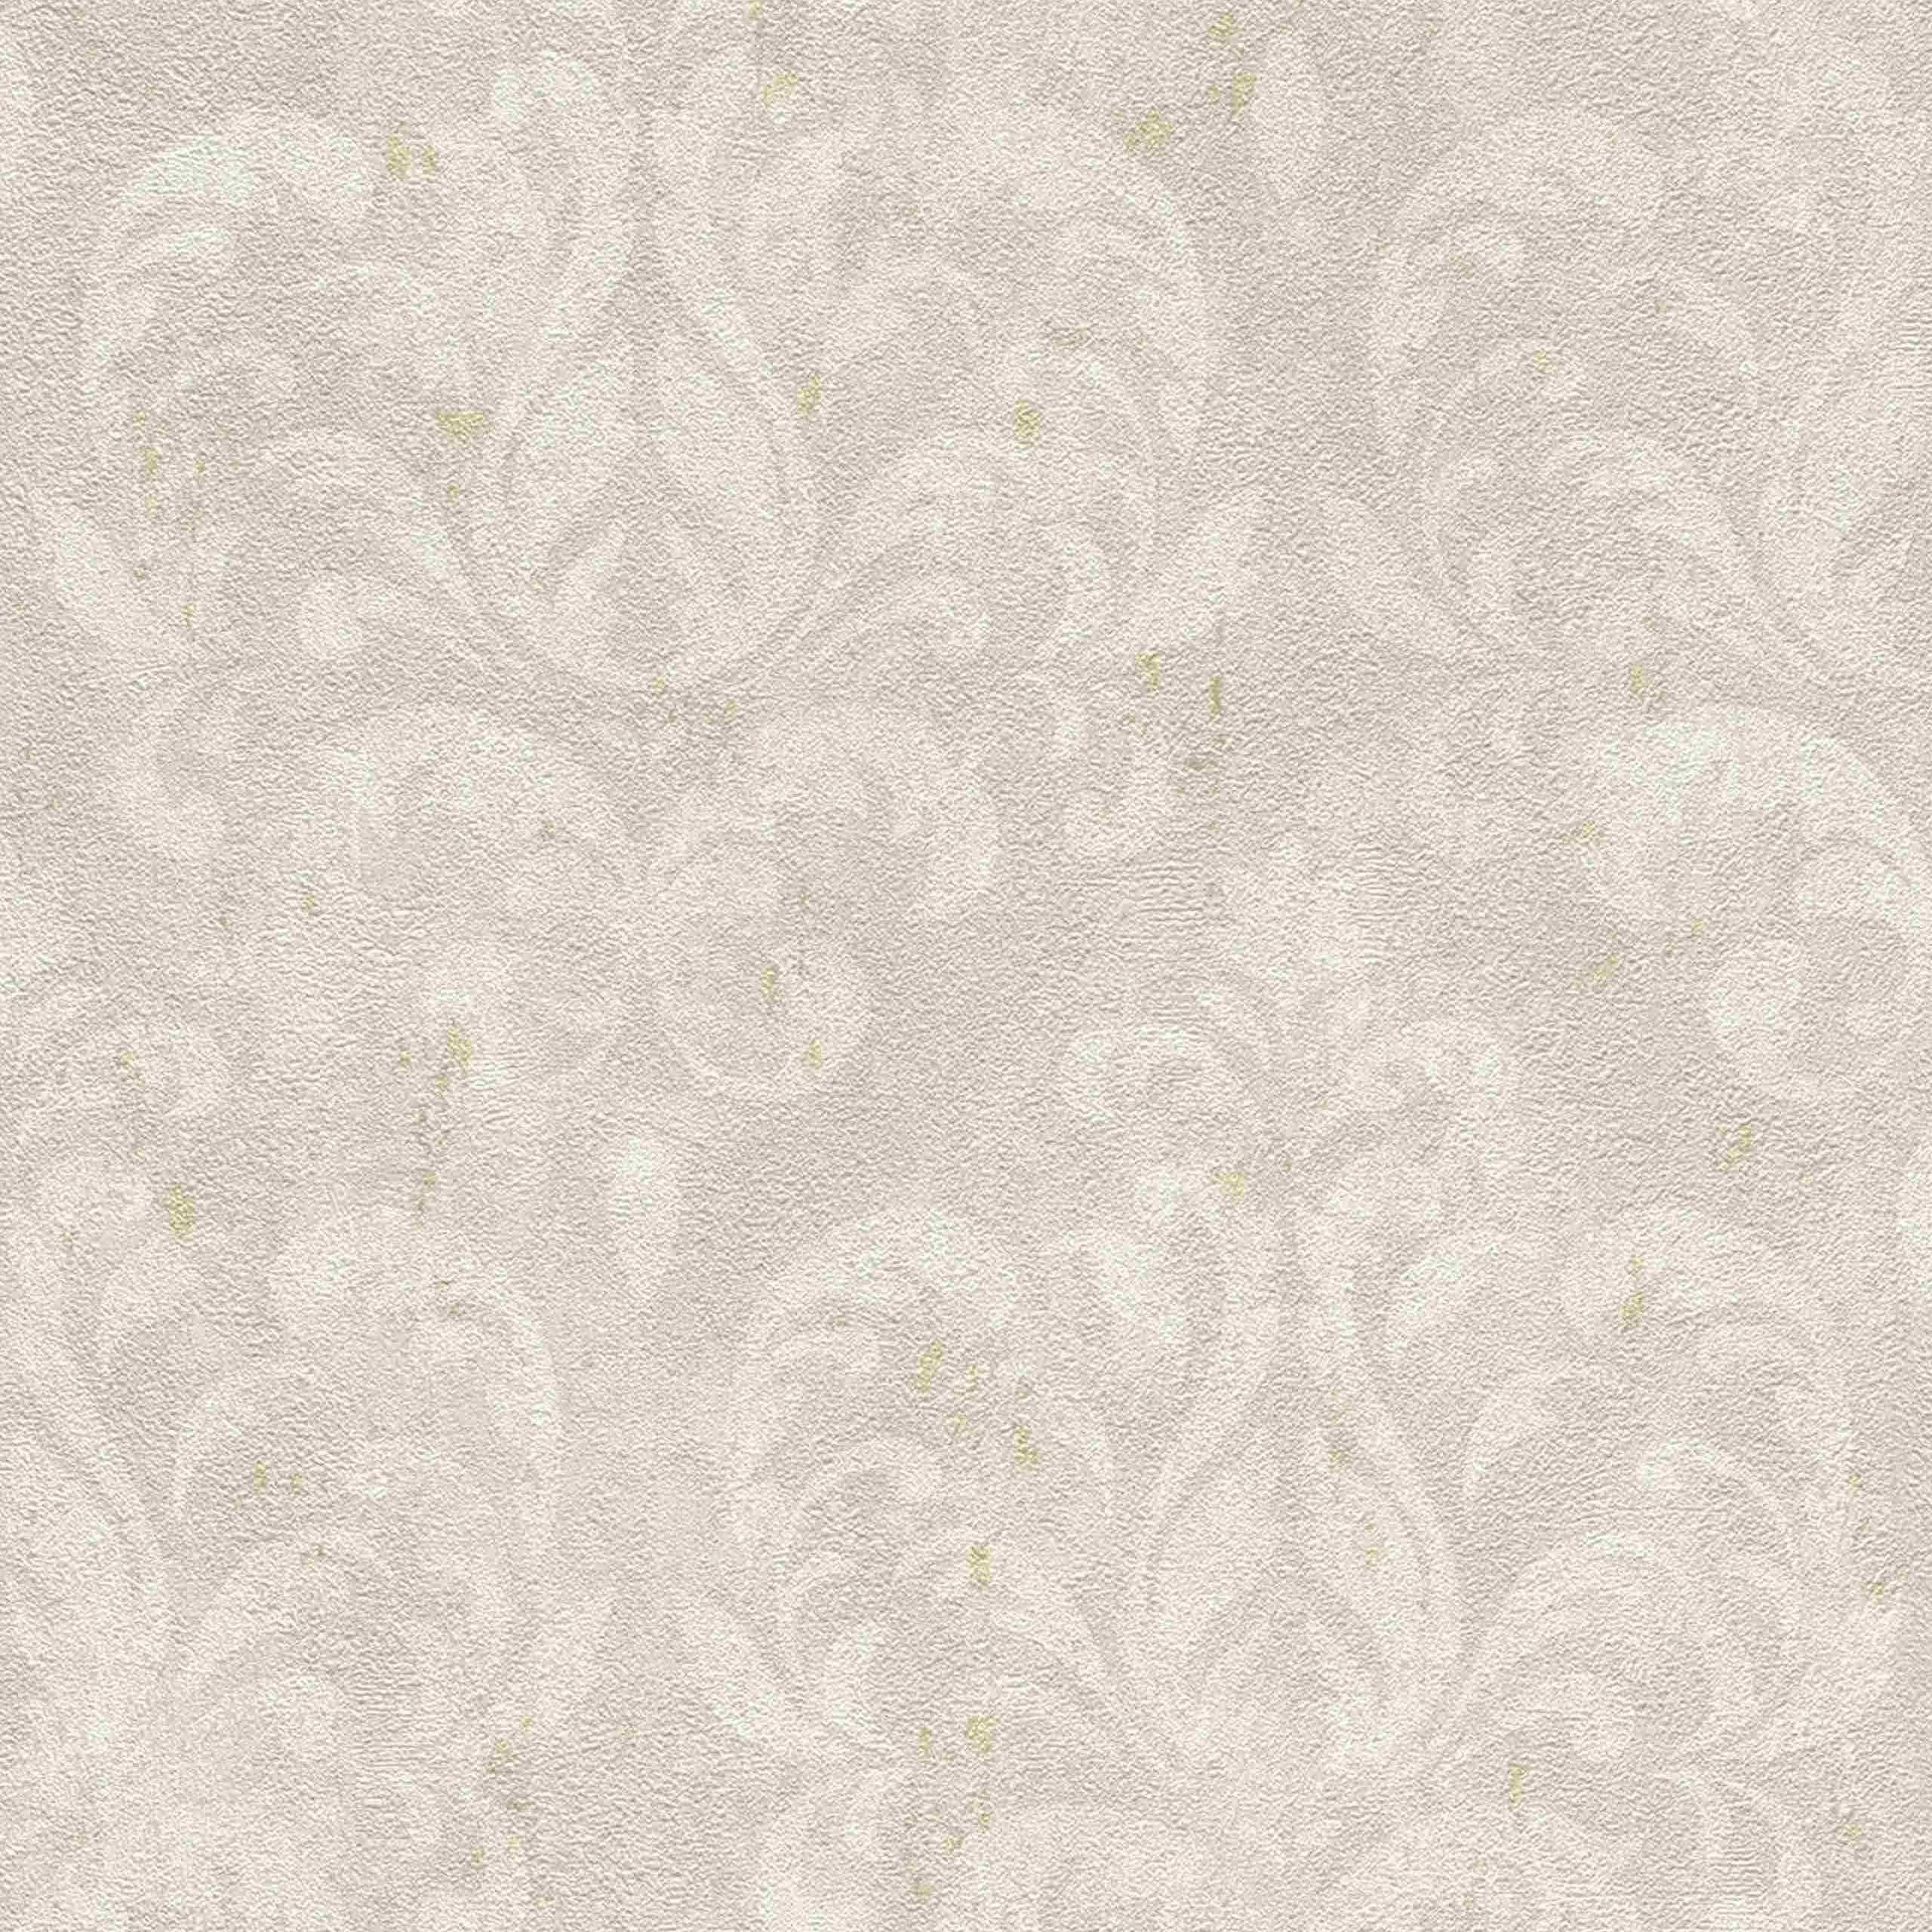 Rasch Vlies-Tapete Kollektion 'Lucera' 608519 Vintage Barock-Dekor